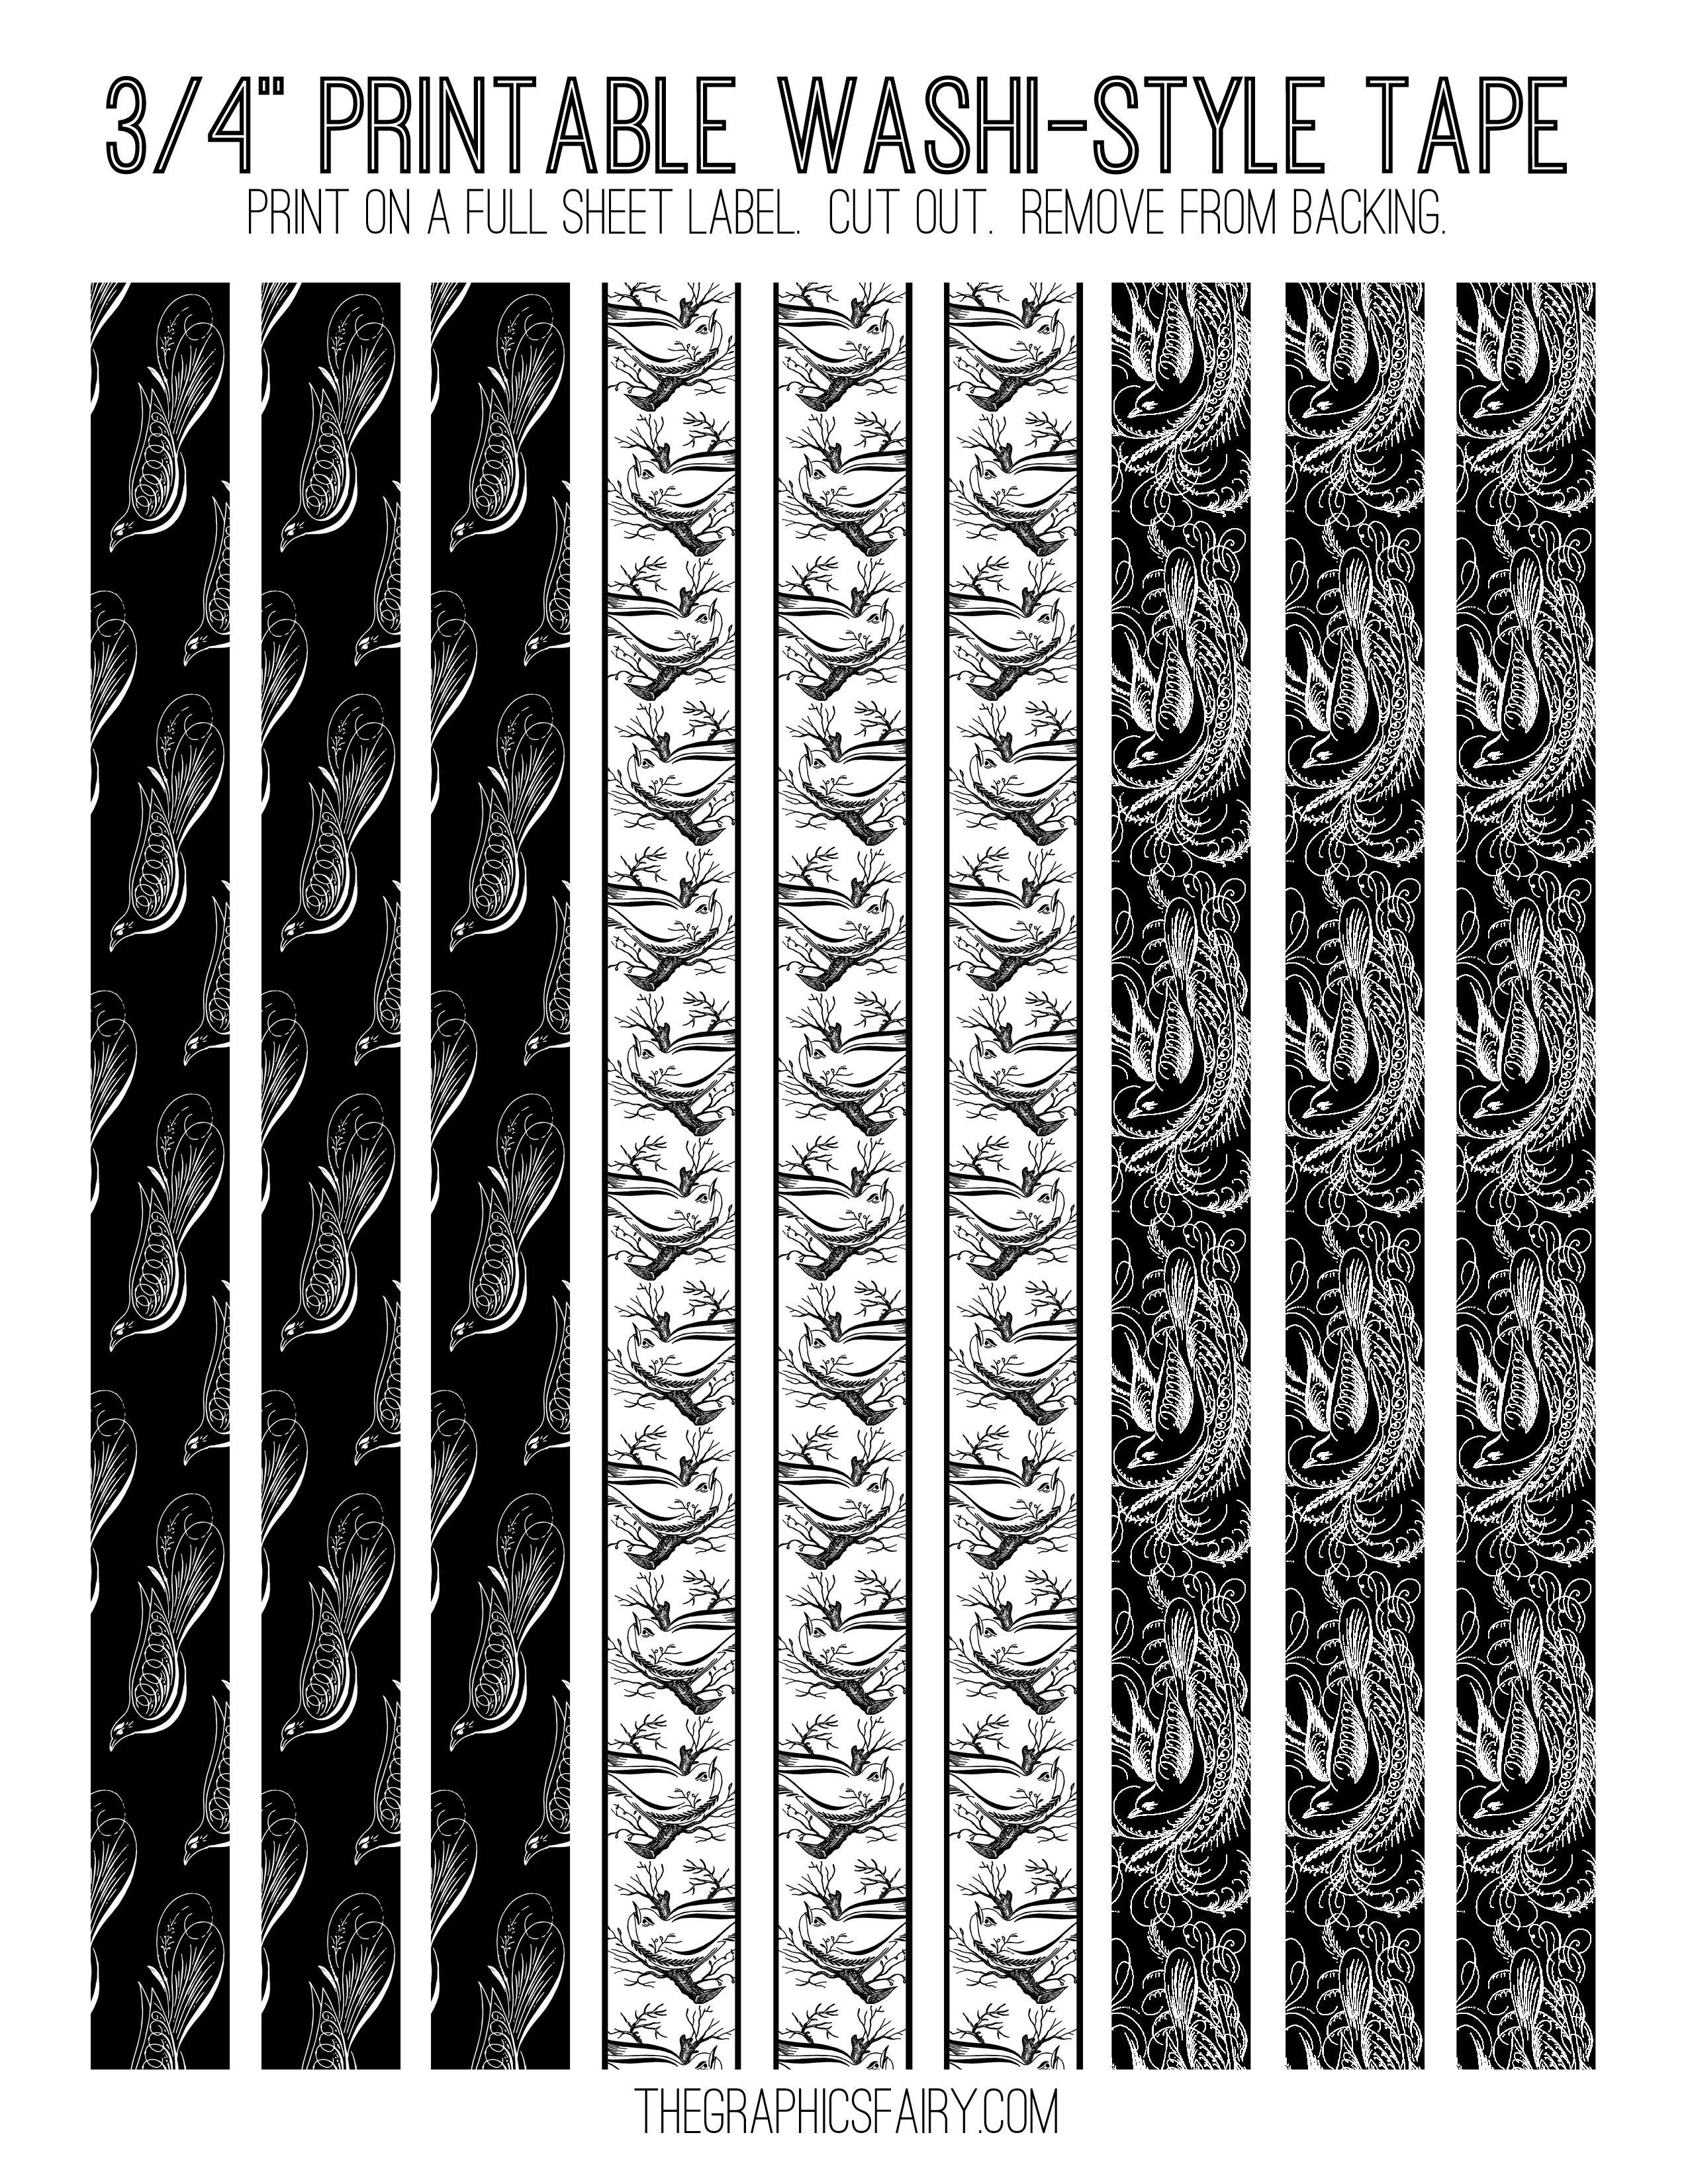 Free Printable Washi Tape - Free Printable Washi Tape